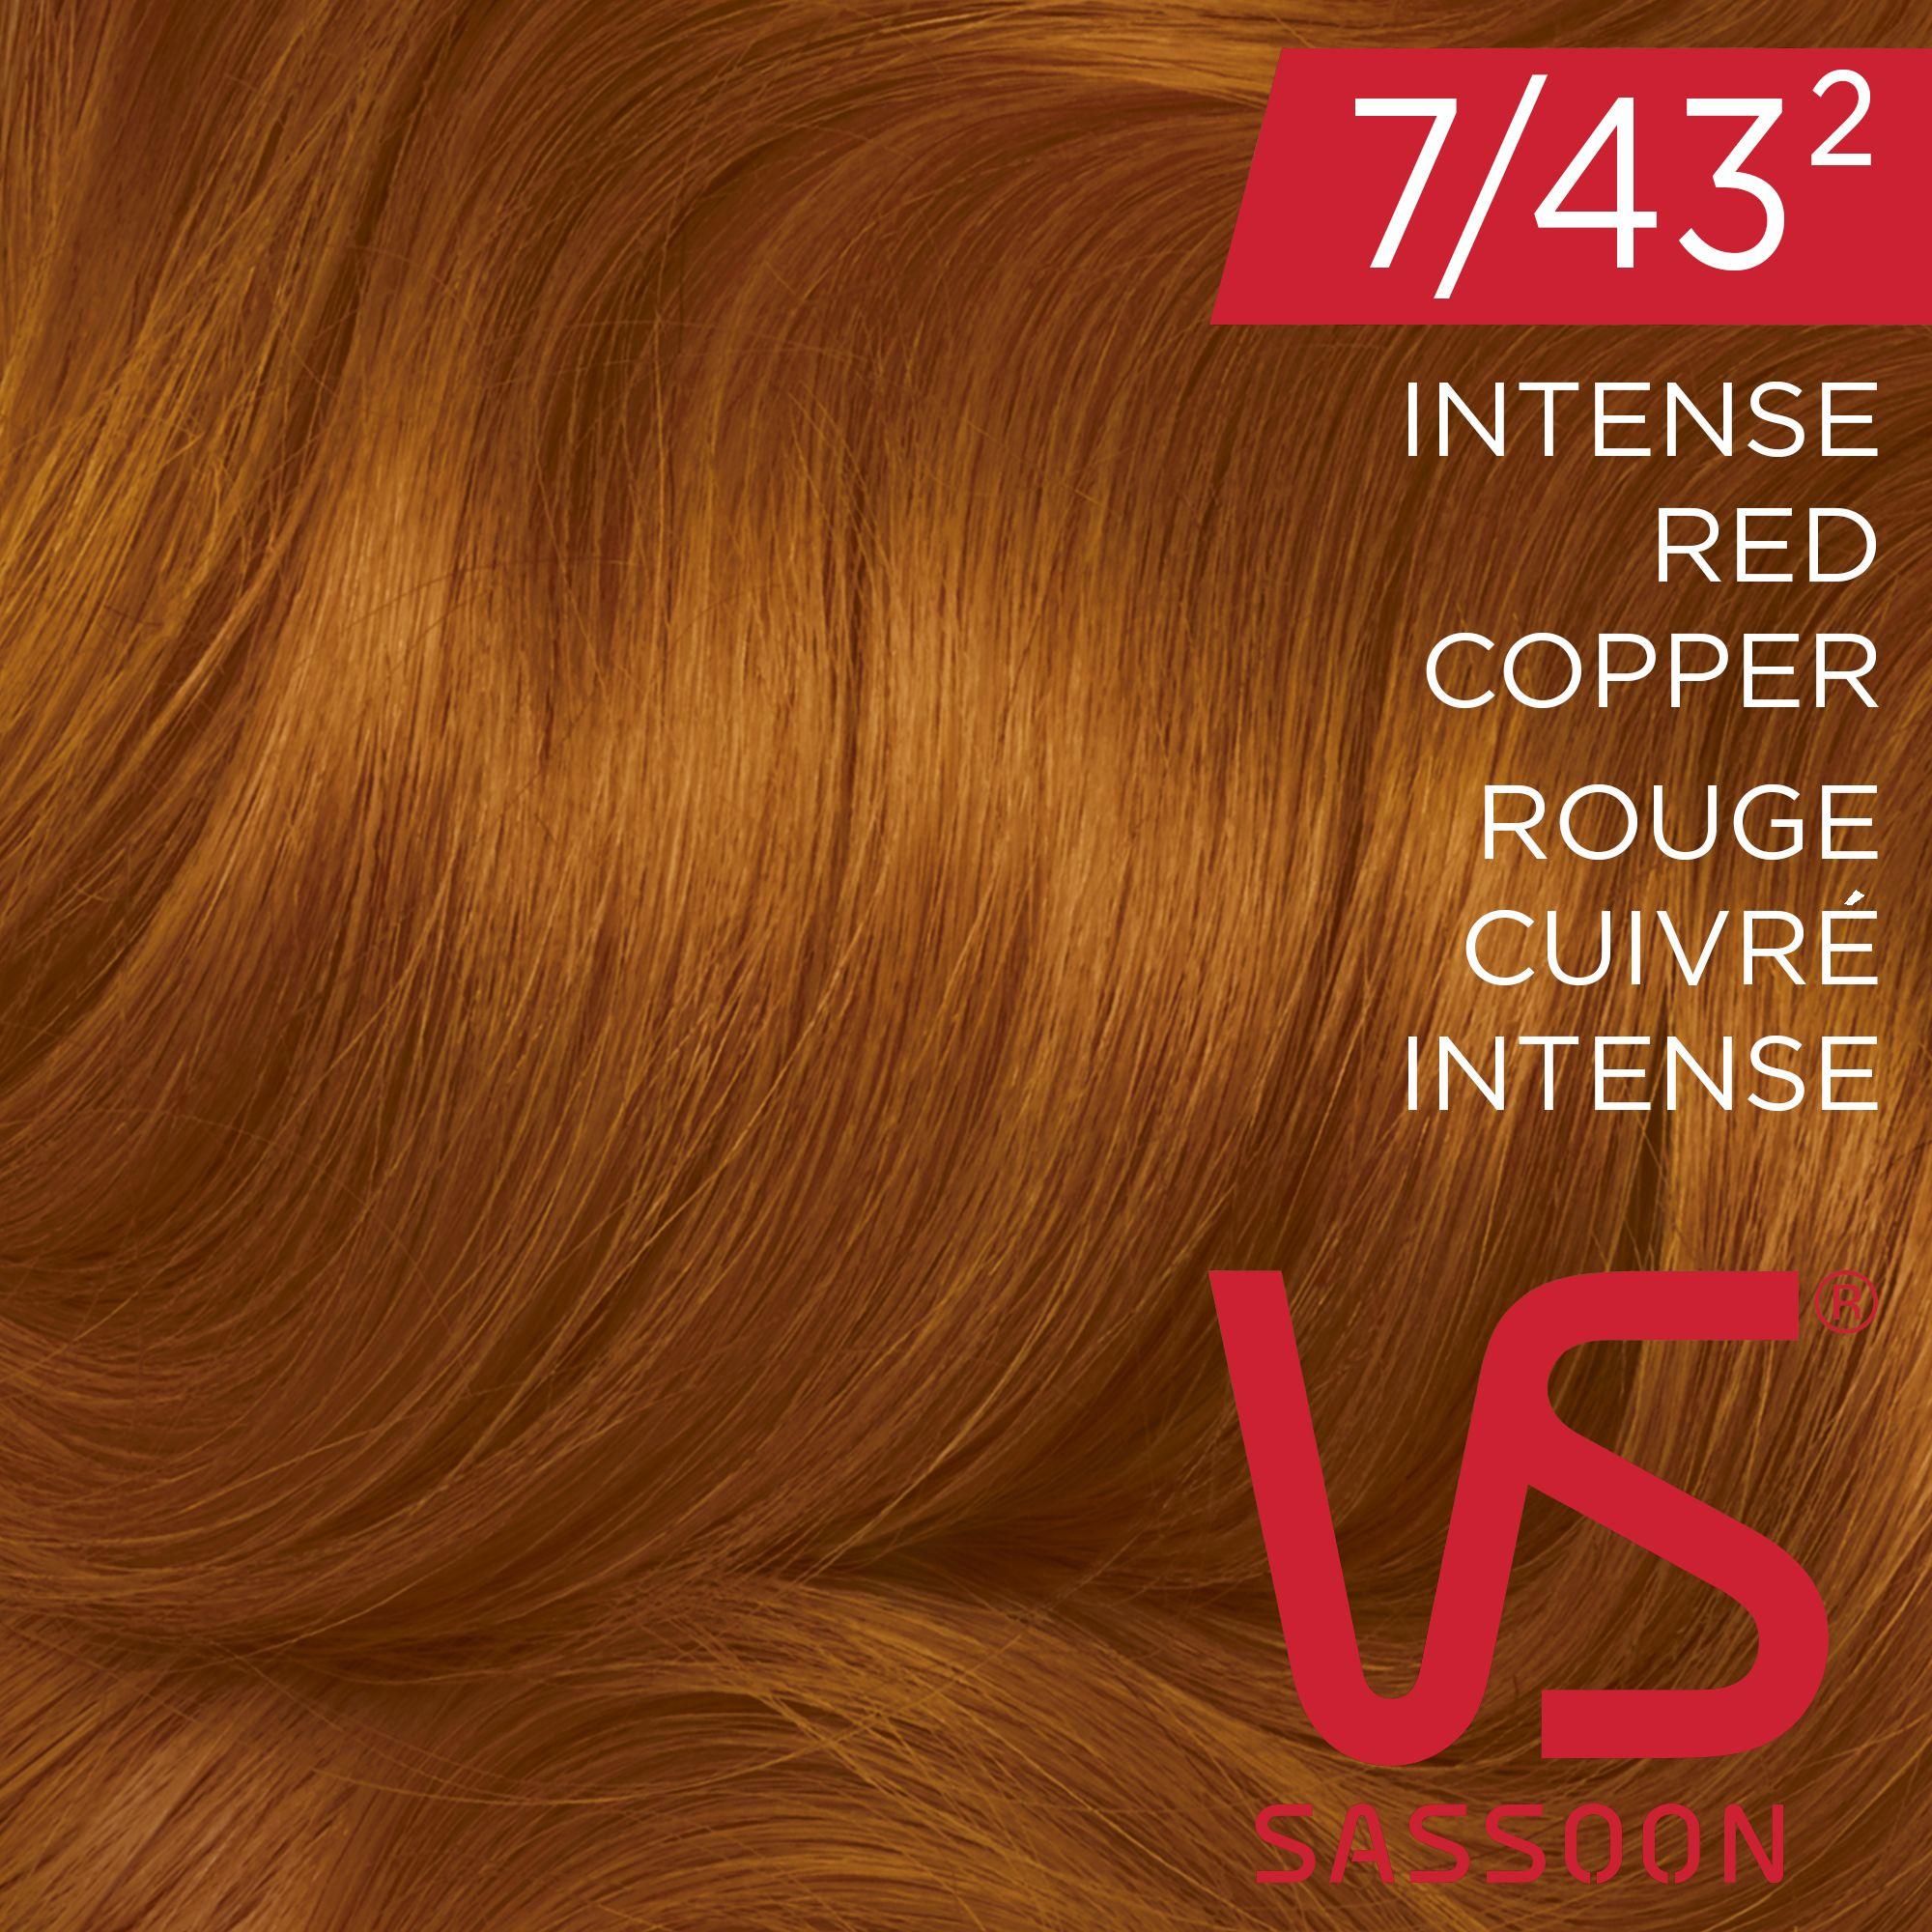 Diy Copper Hair Color Vidal Sassoon Salonist 7432 Intense Red